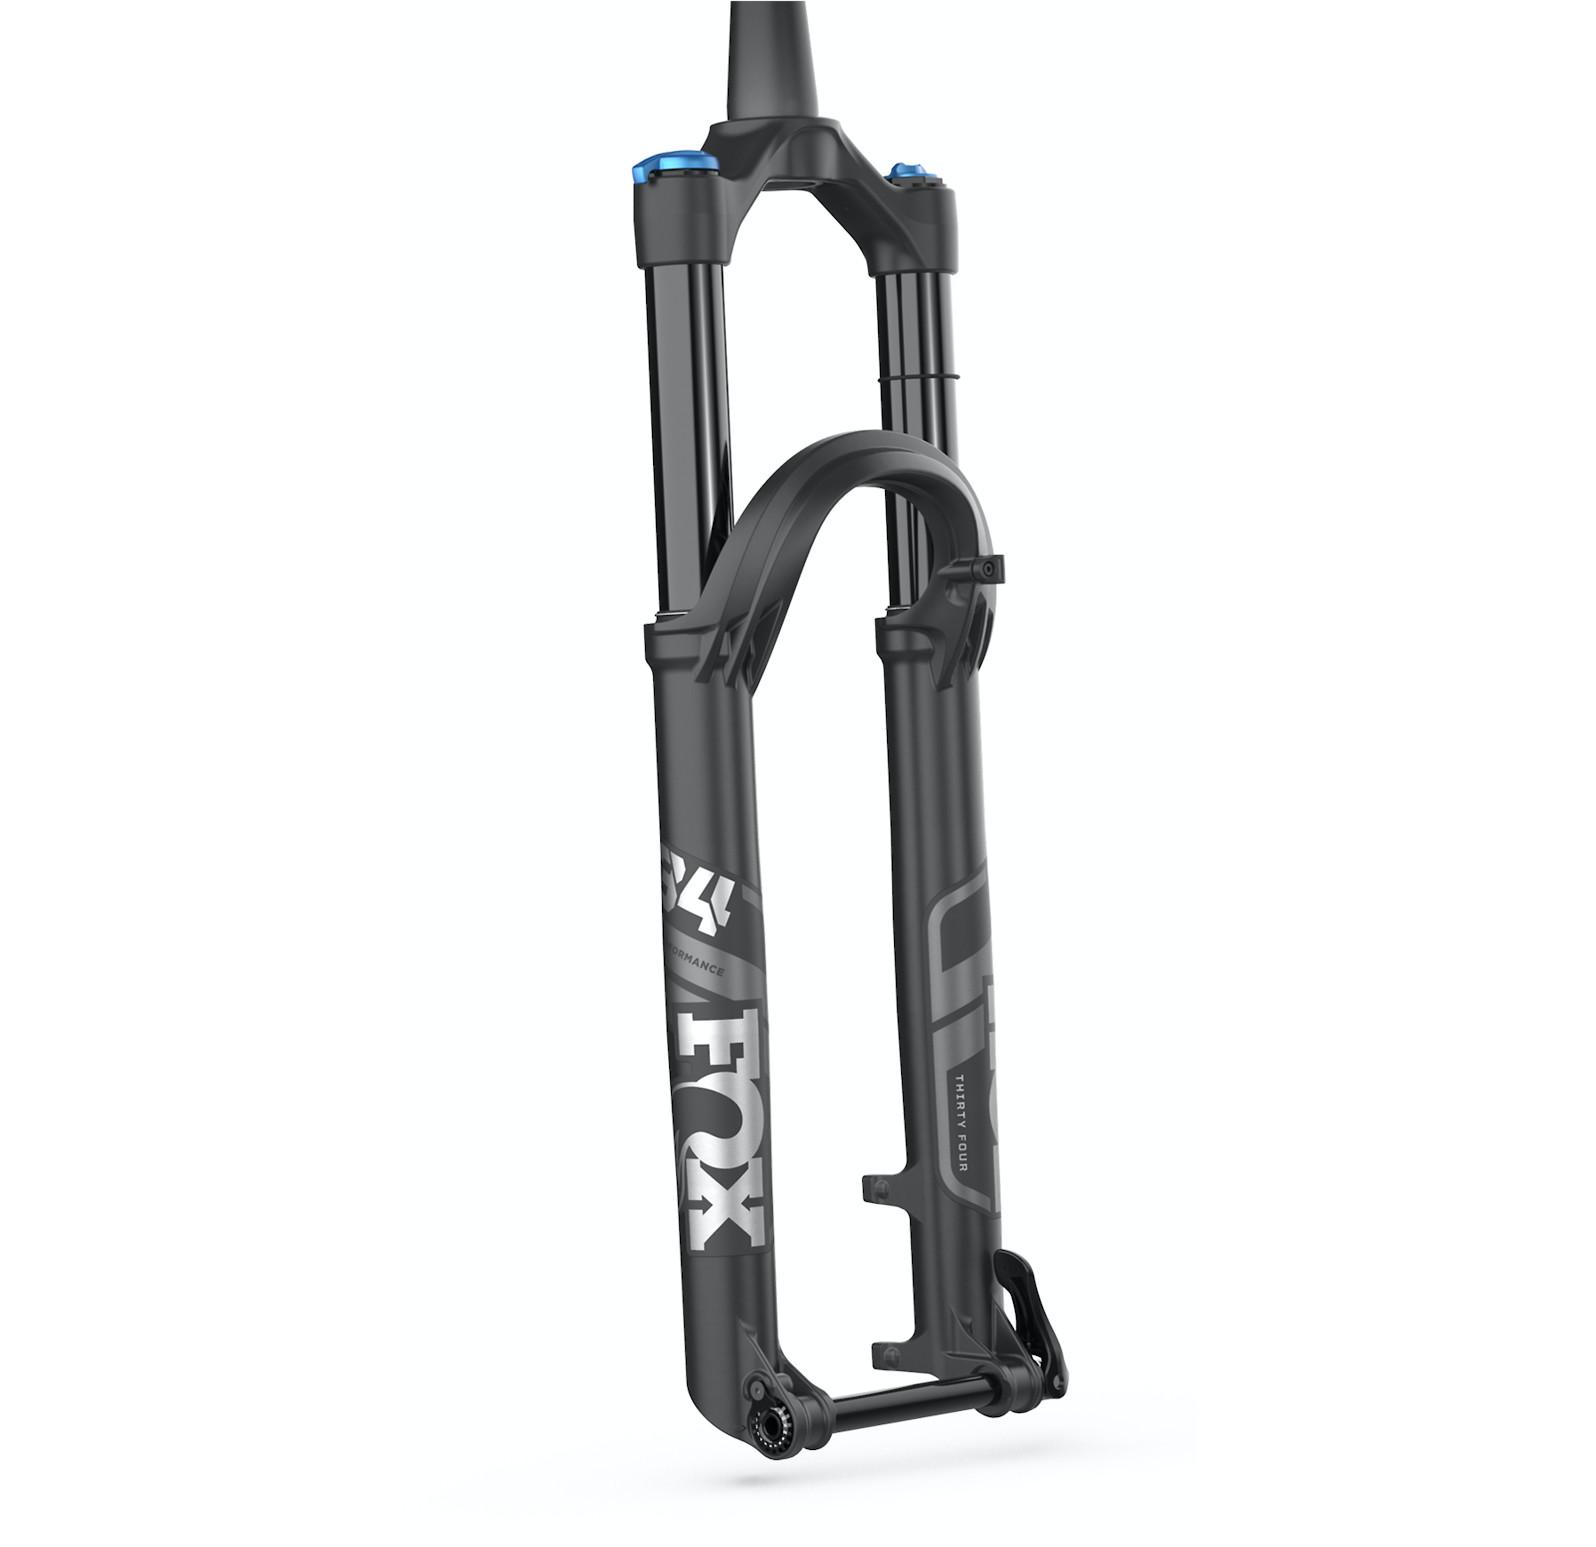 2022 FOX 34 Performance GRIP Fork